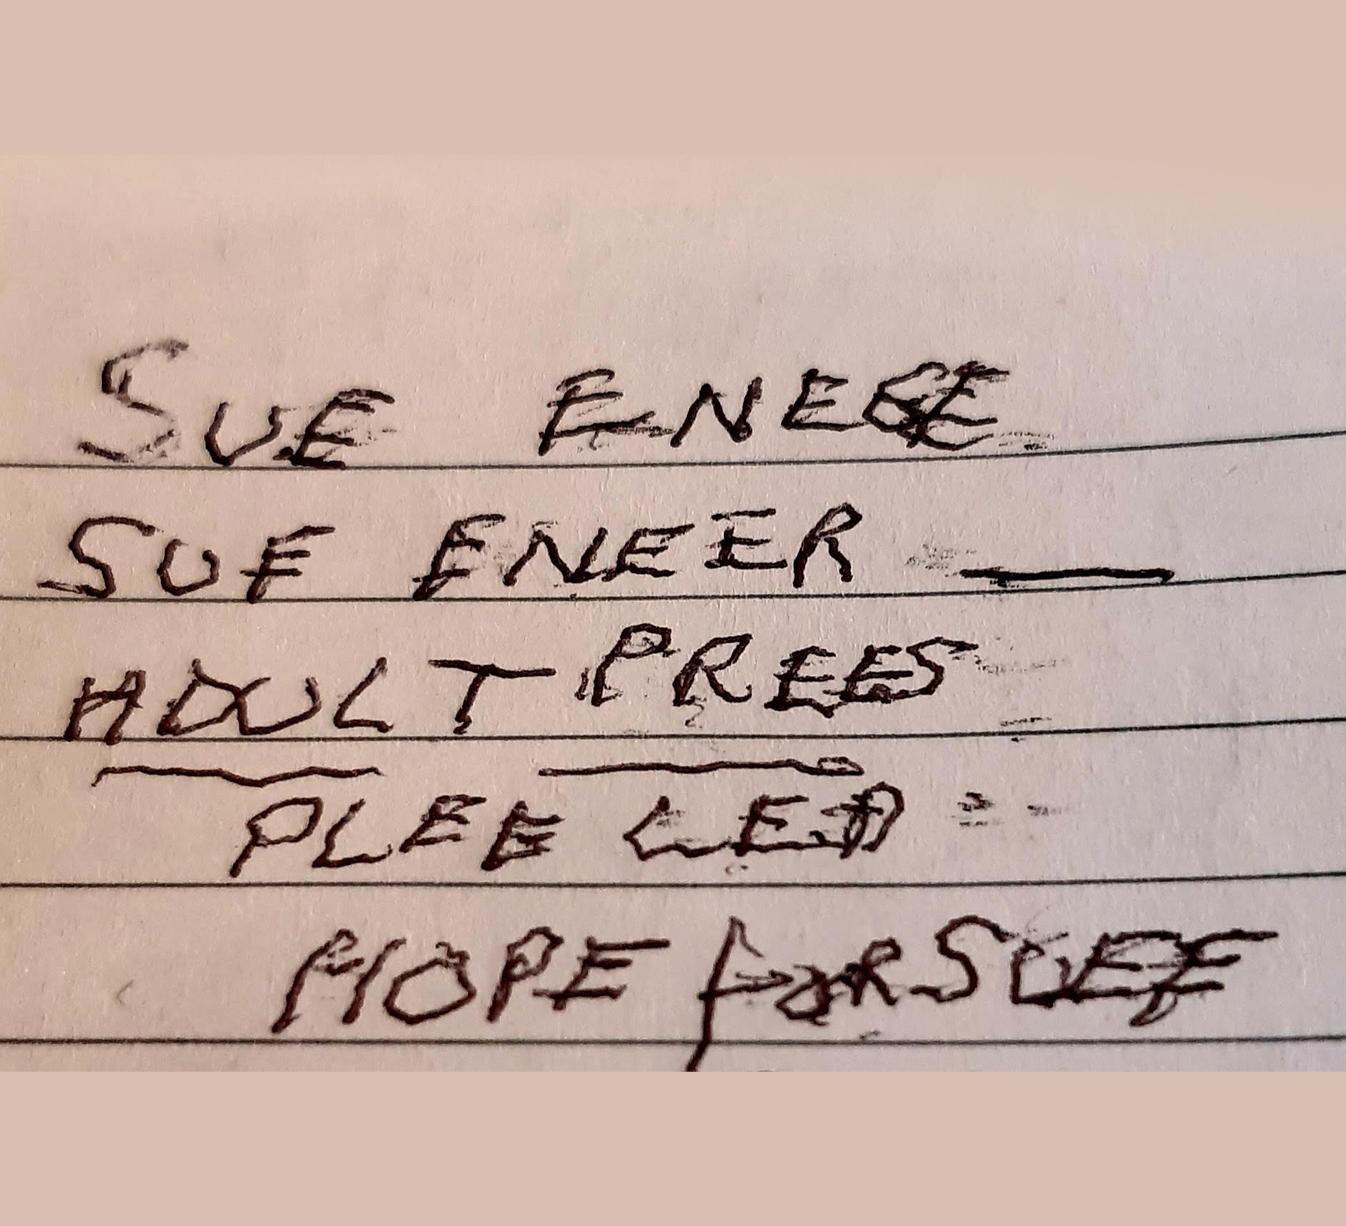 Hope for Suee